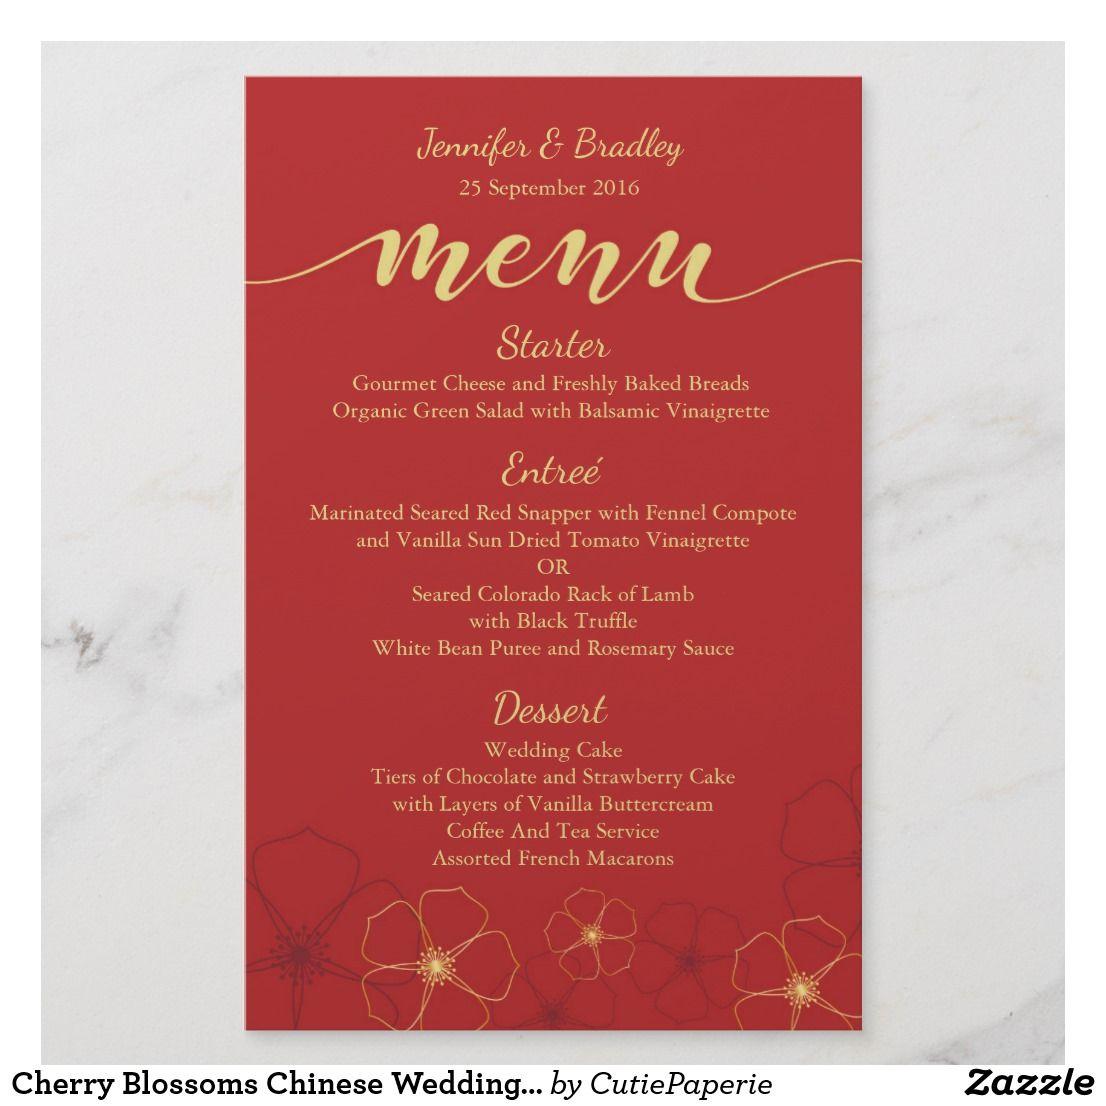 Chinese Wedding Food Menu: Cherry Blossoms Chinese Wedding Dinner Menu